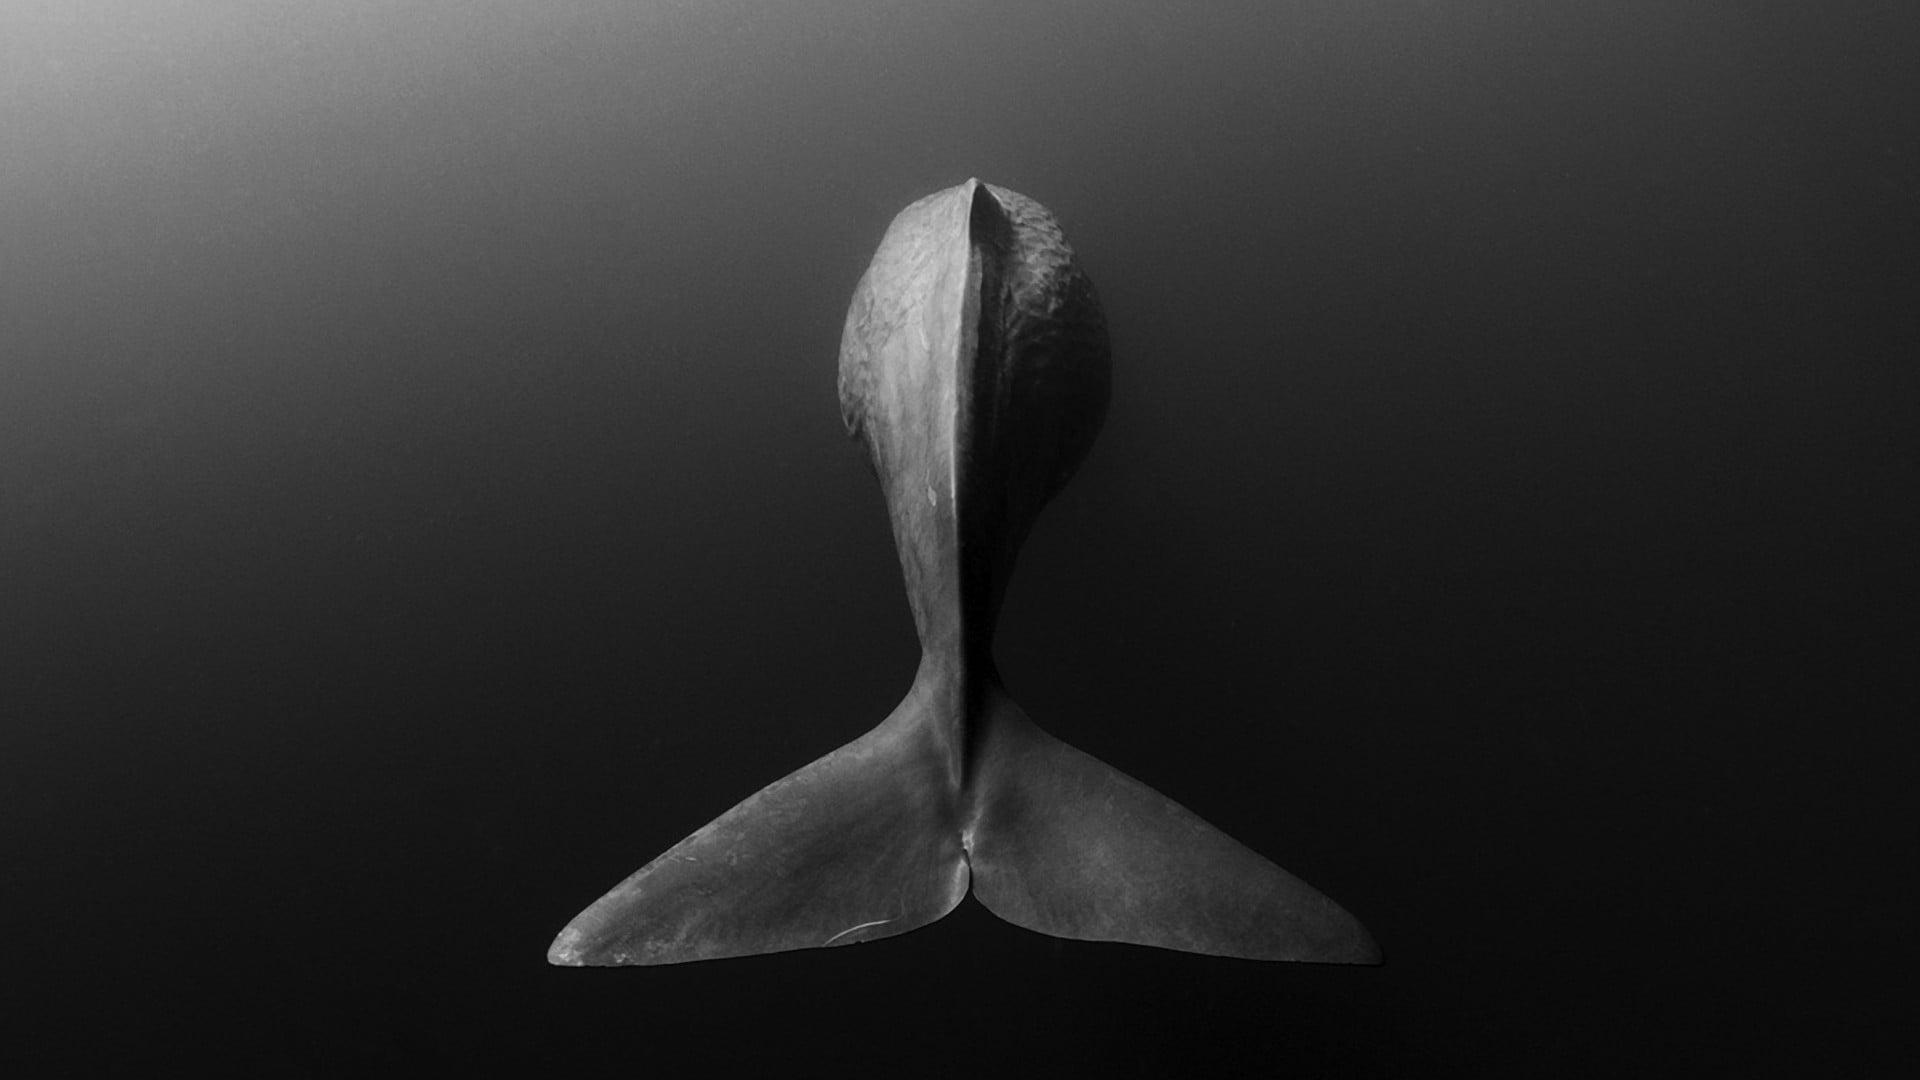 Black fish tail decor animals whale monochrome HD wallpaper 1920x1080